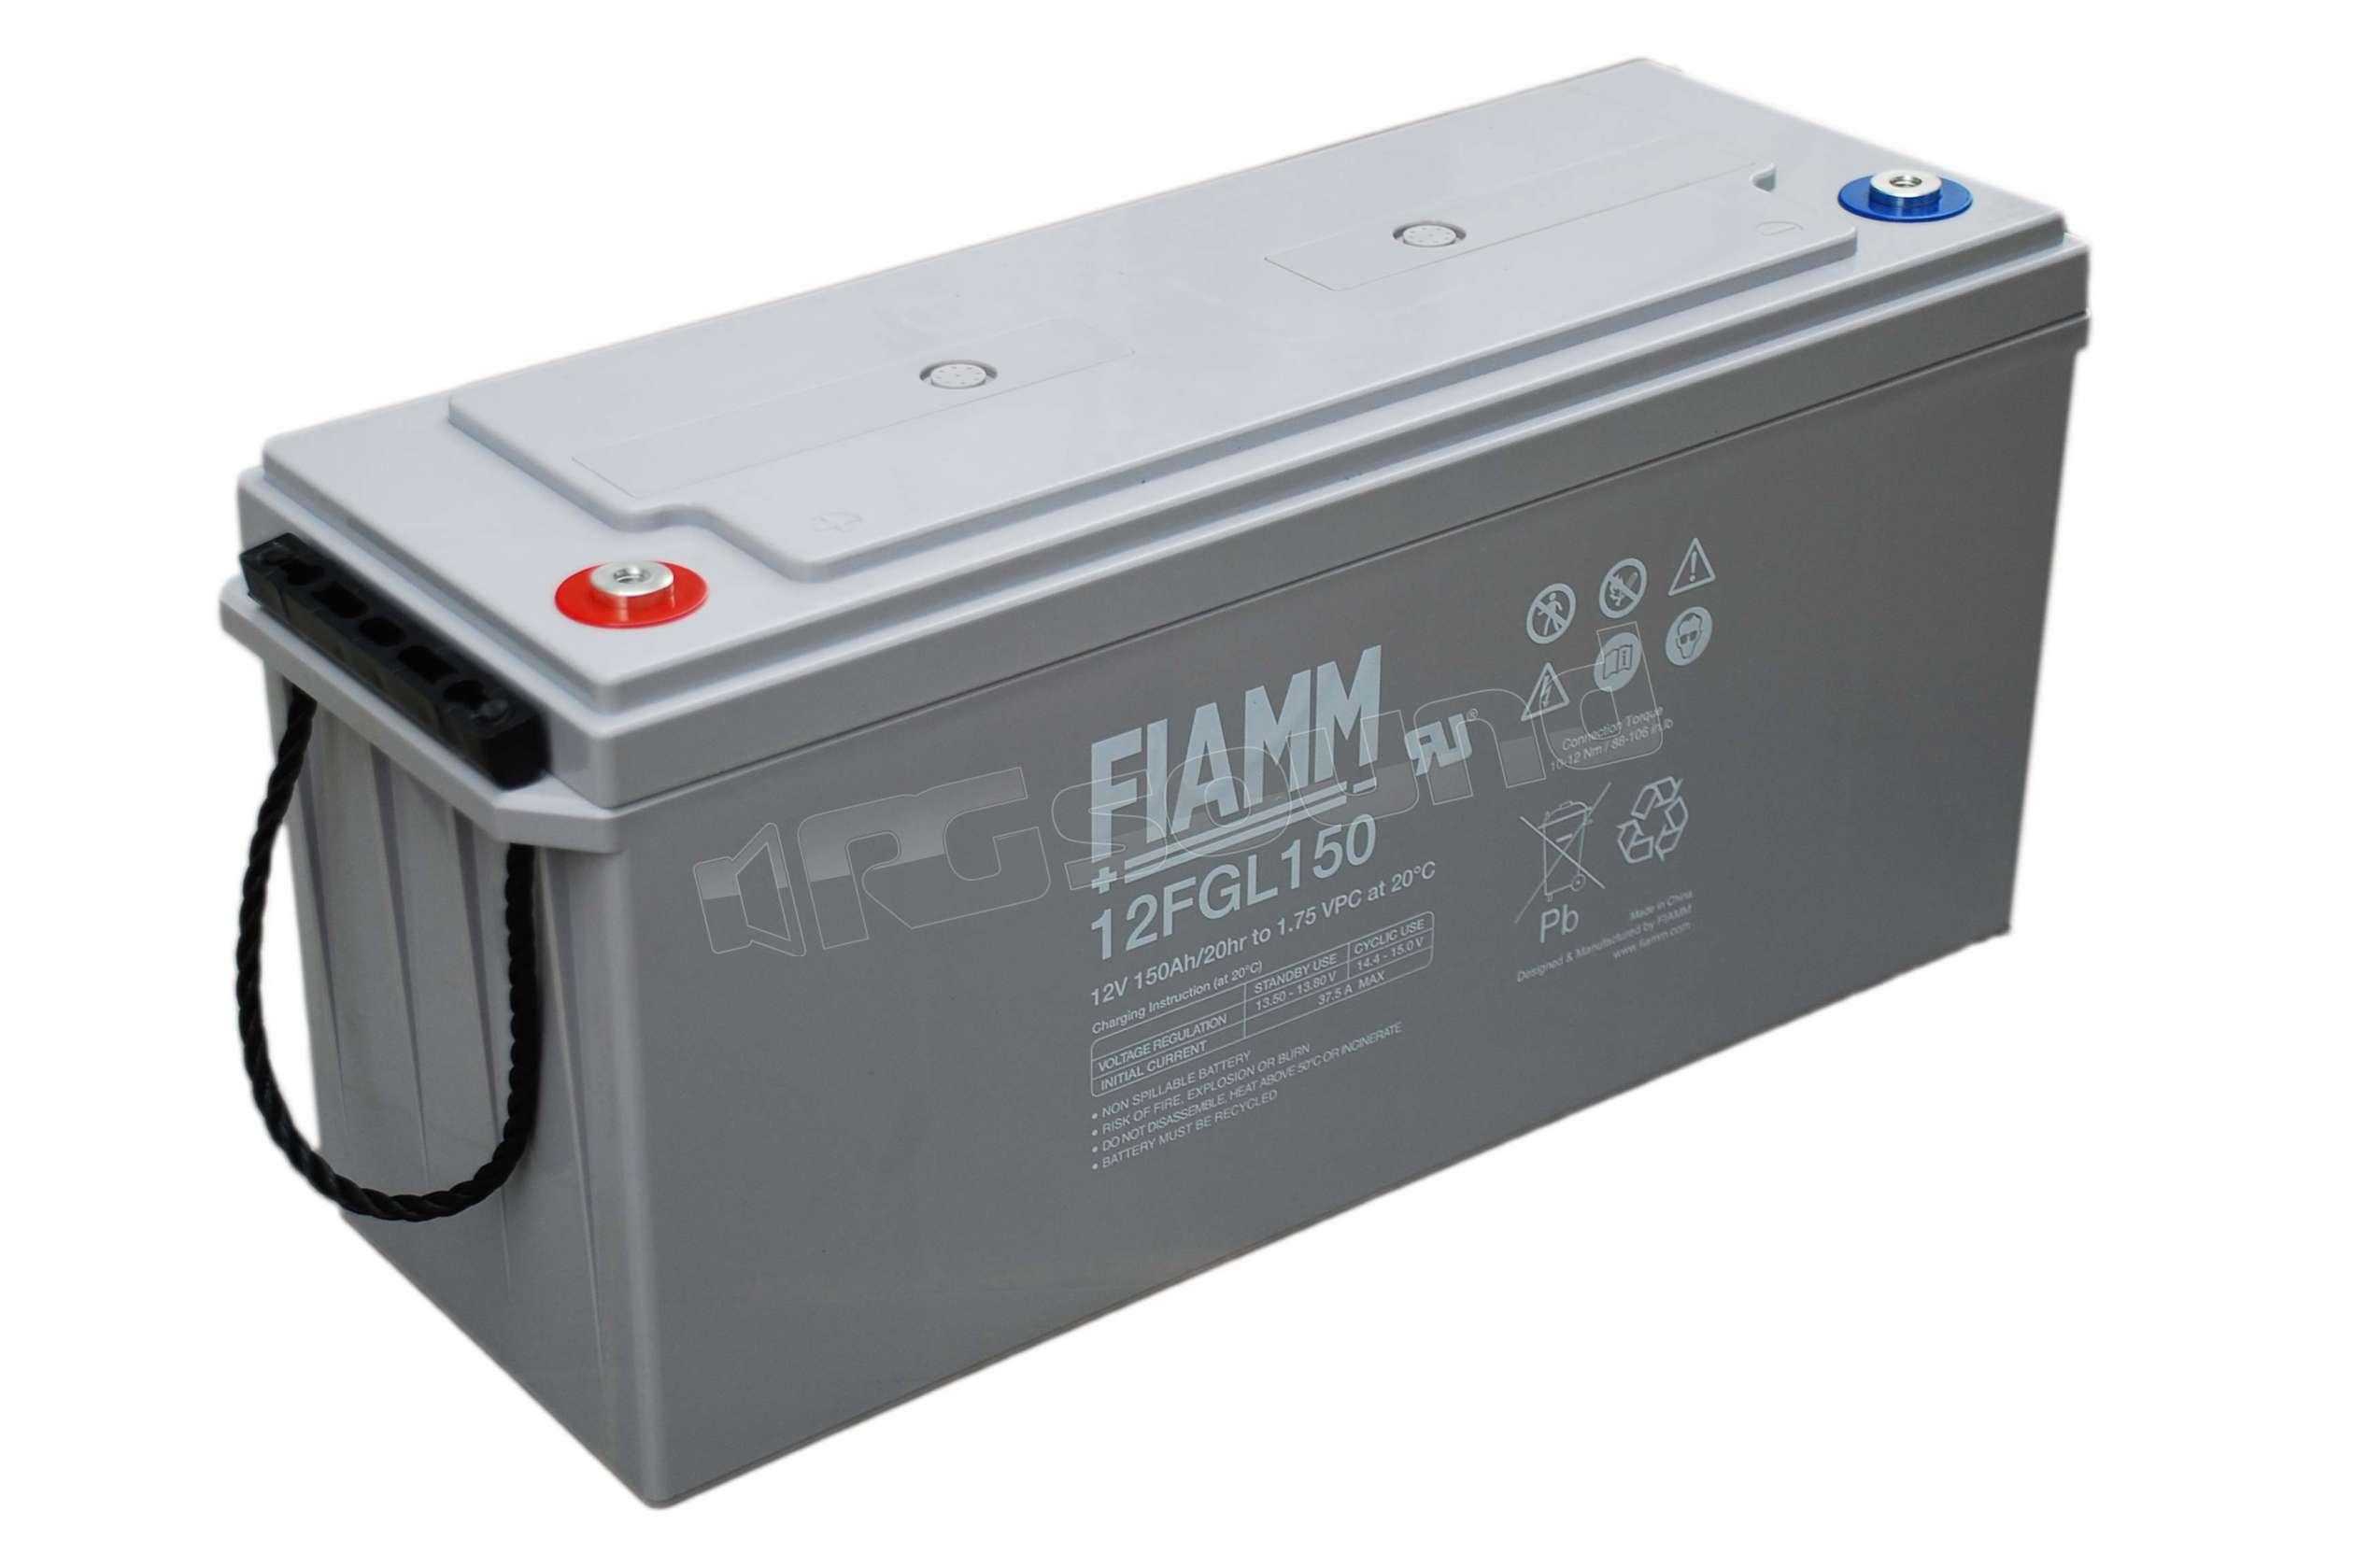 Gps Car Tracker >> Fiamm 12FGL150 batteria servizio 150Ah | Batterie per ...